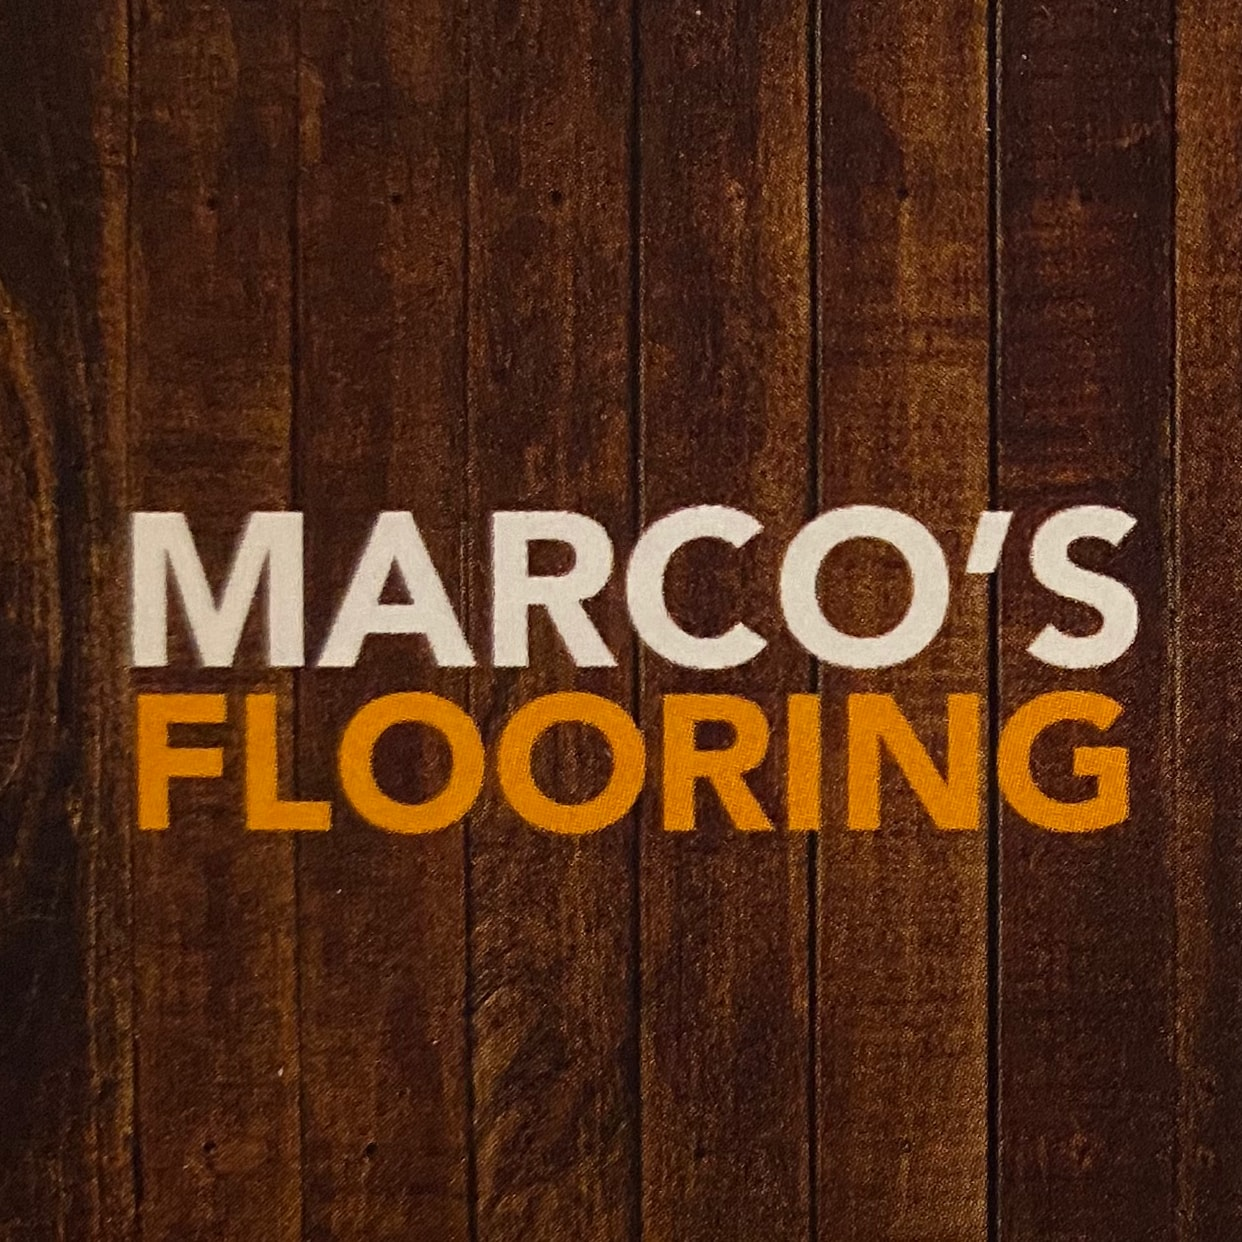 Marcos Flooring